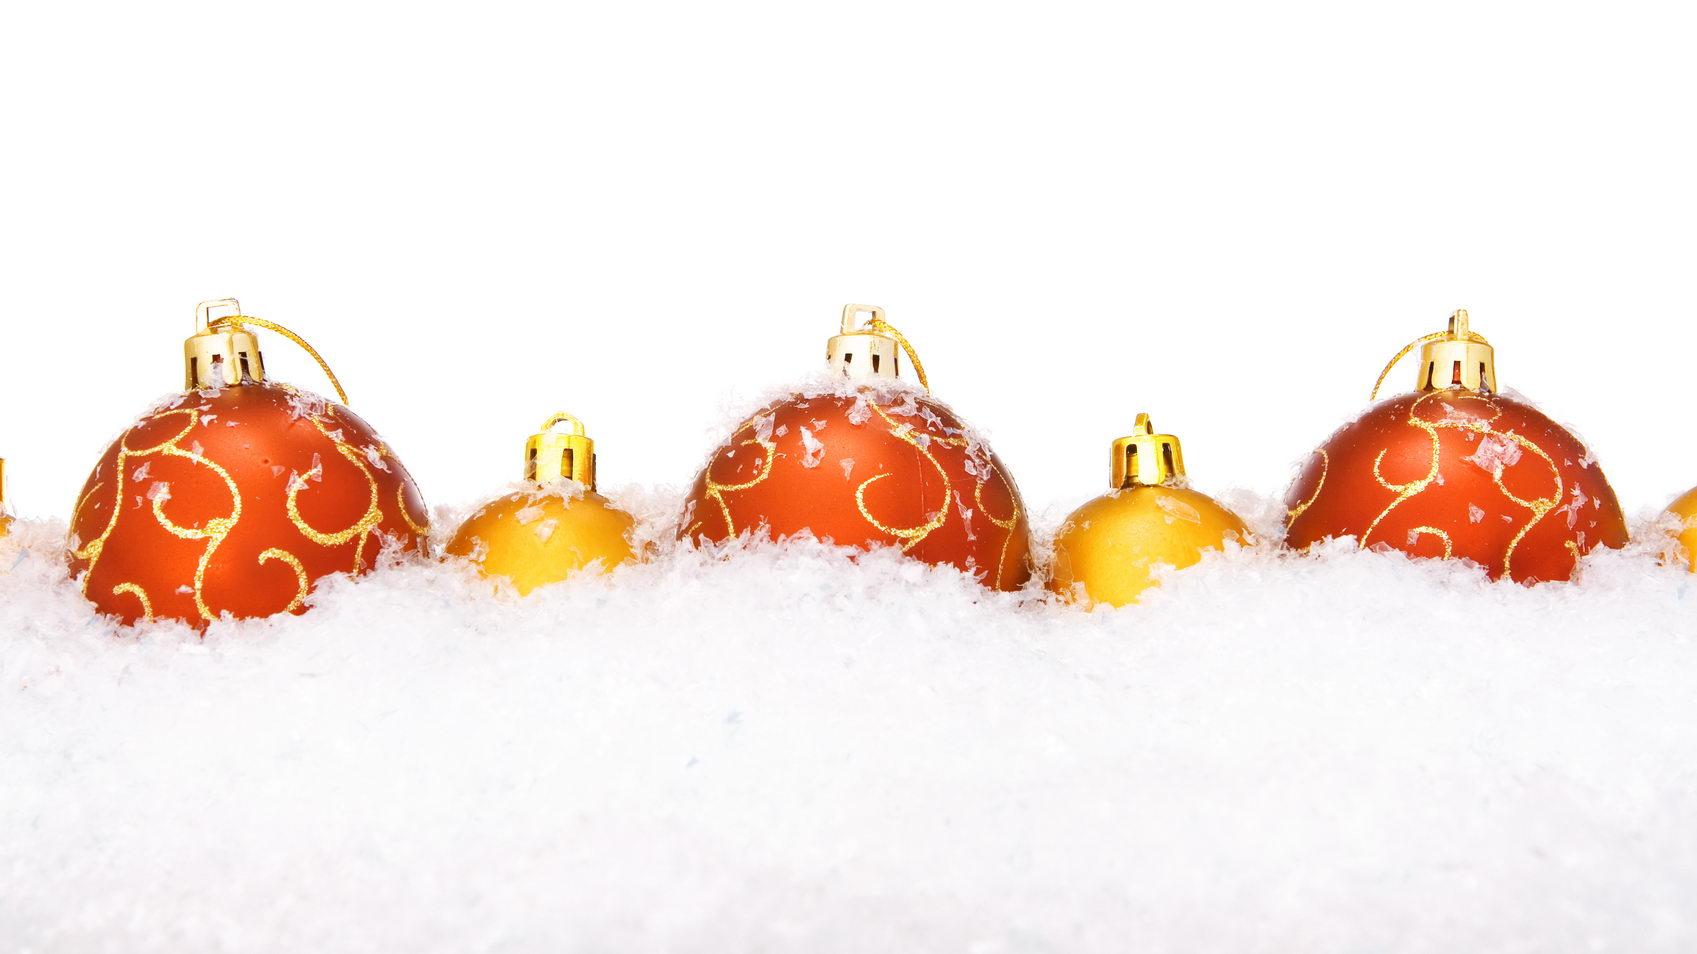 Christmas balls, Backdrop, Shape, New, Object, HQ Photo